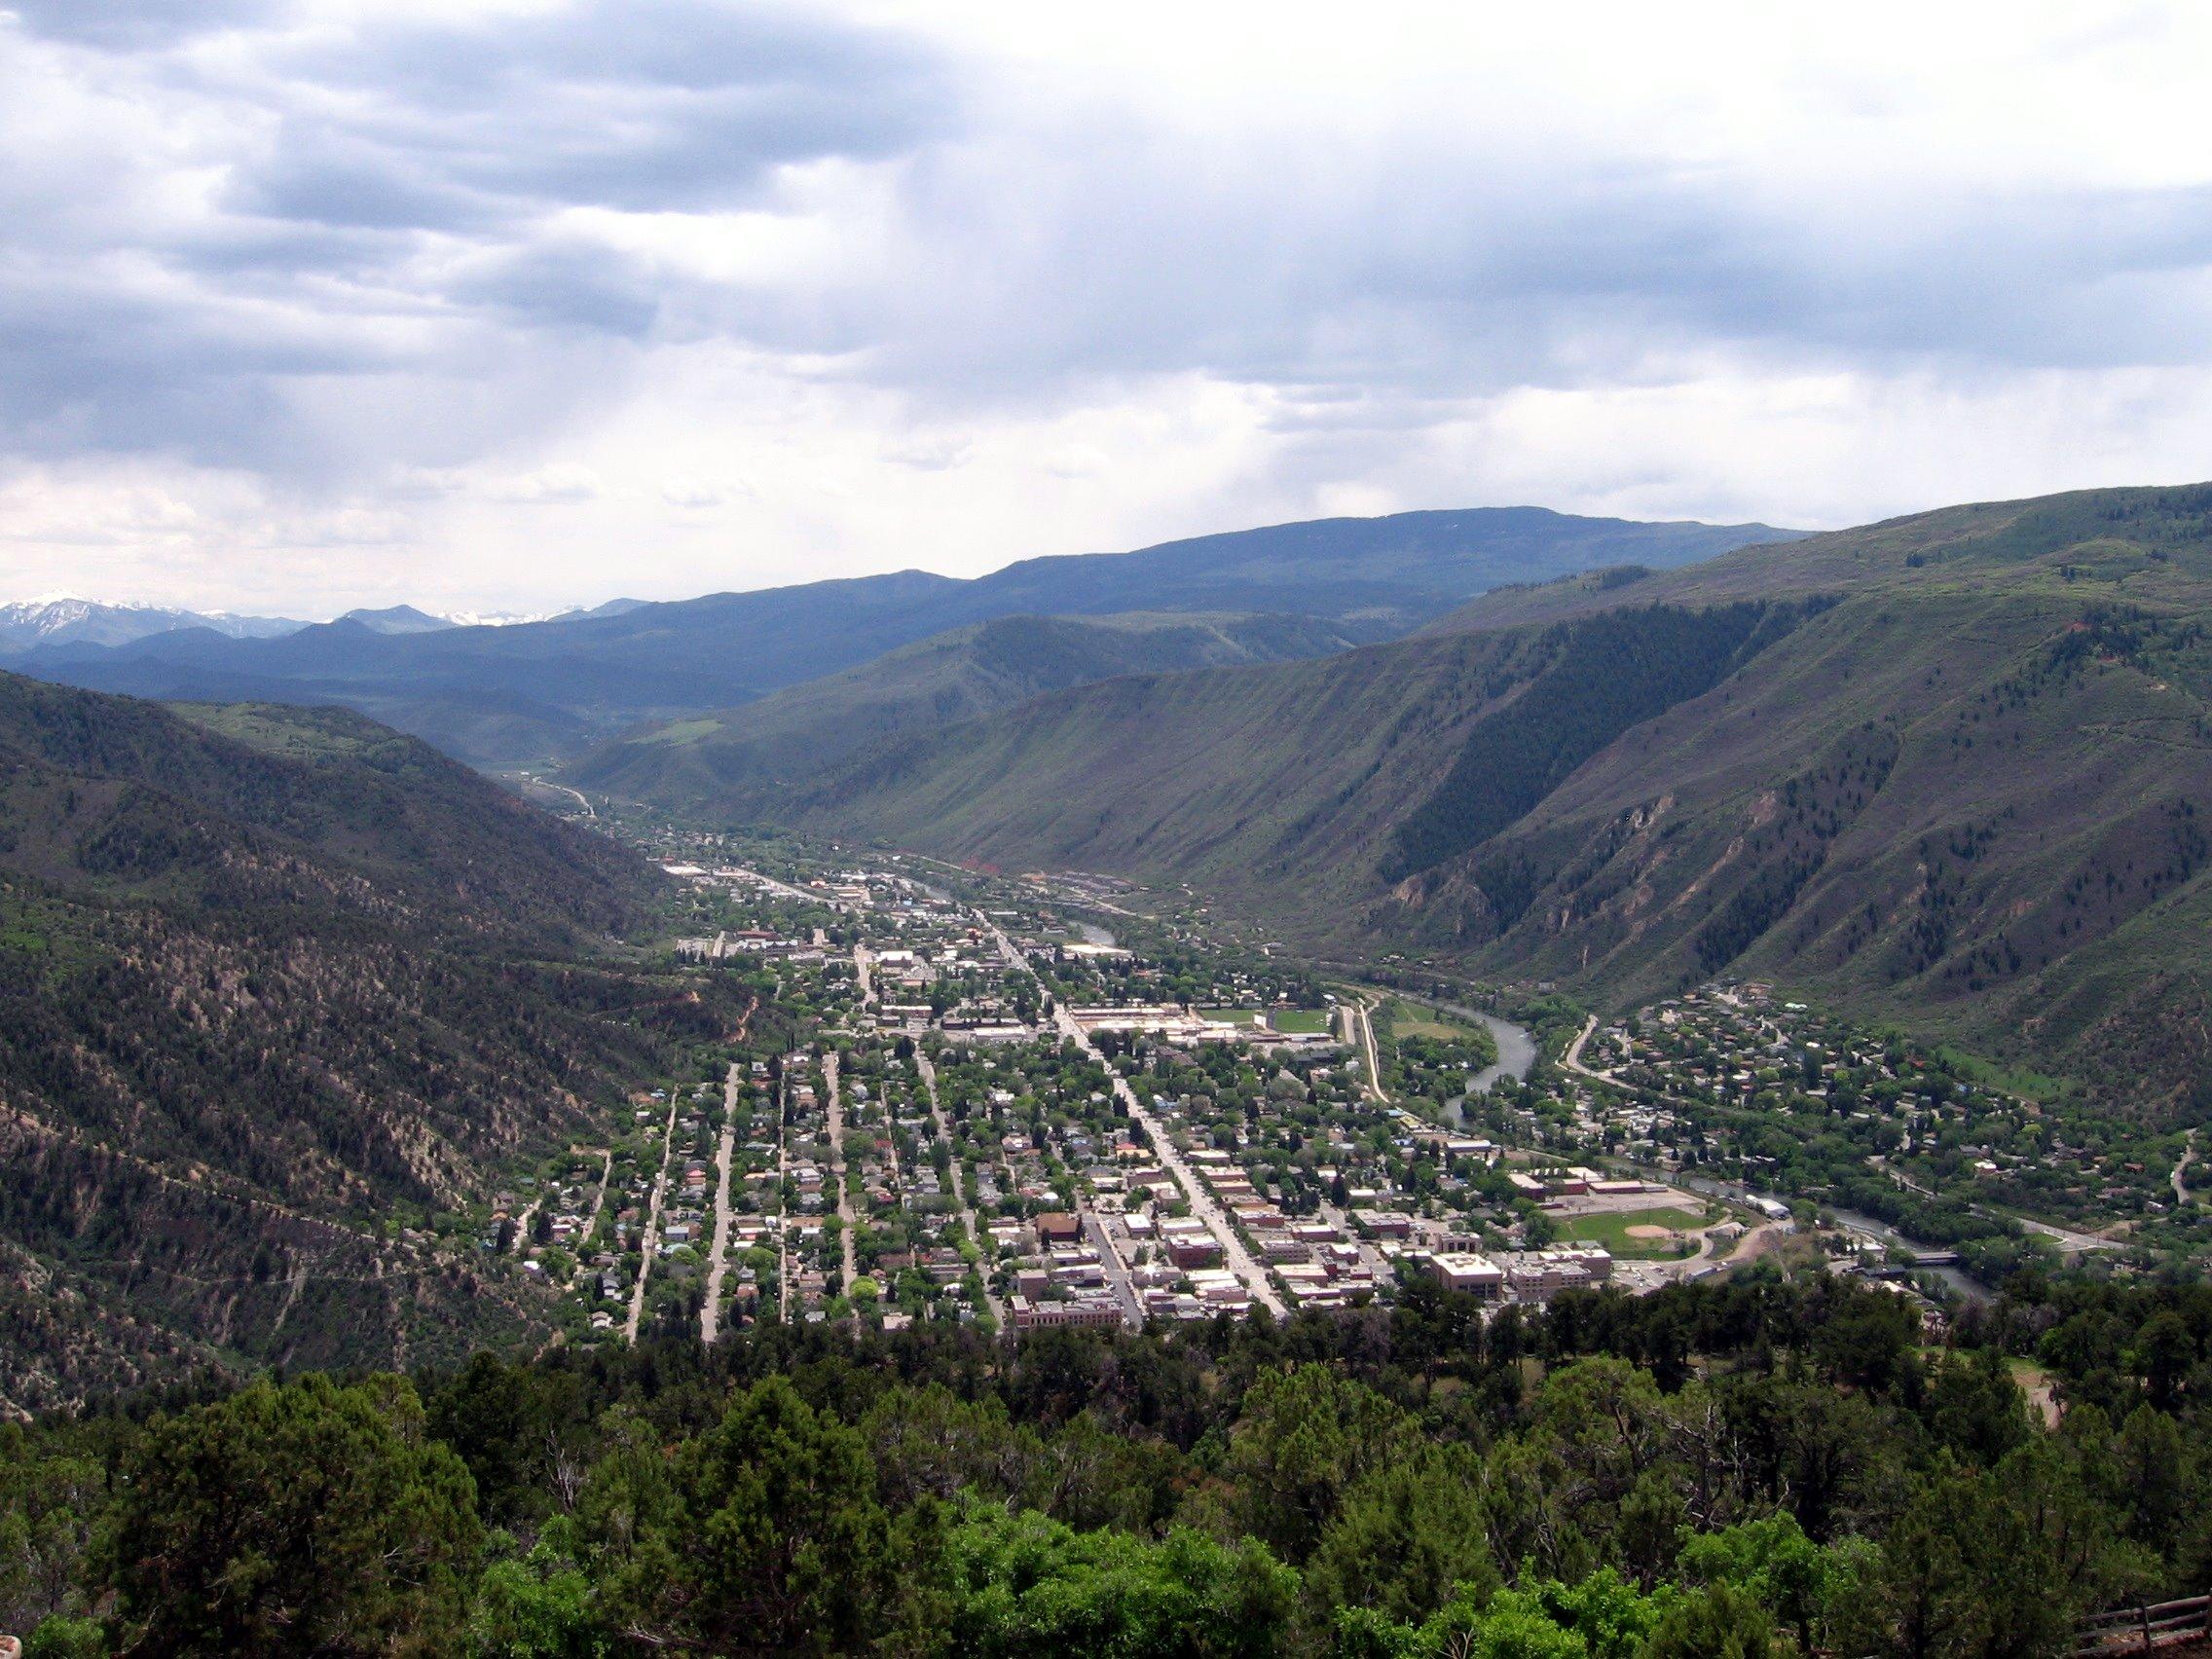 Glenwood Springs Funeral Homes, funeral services & flowers in Colorado